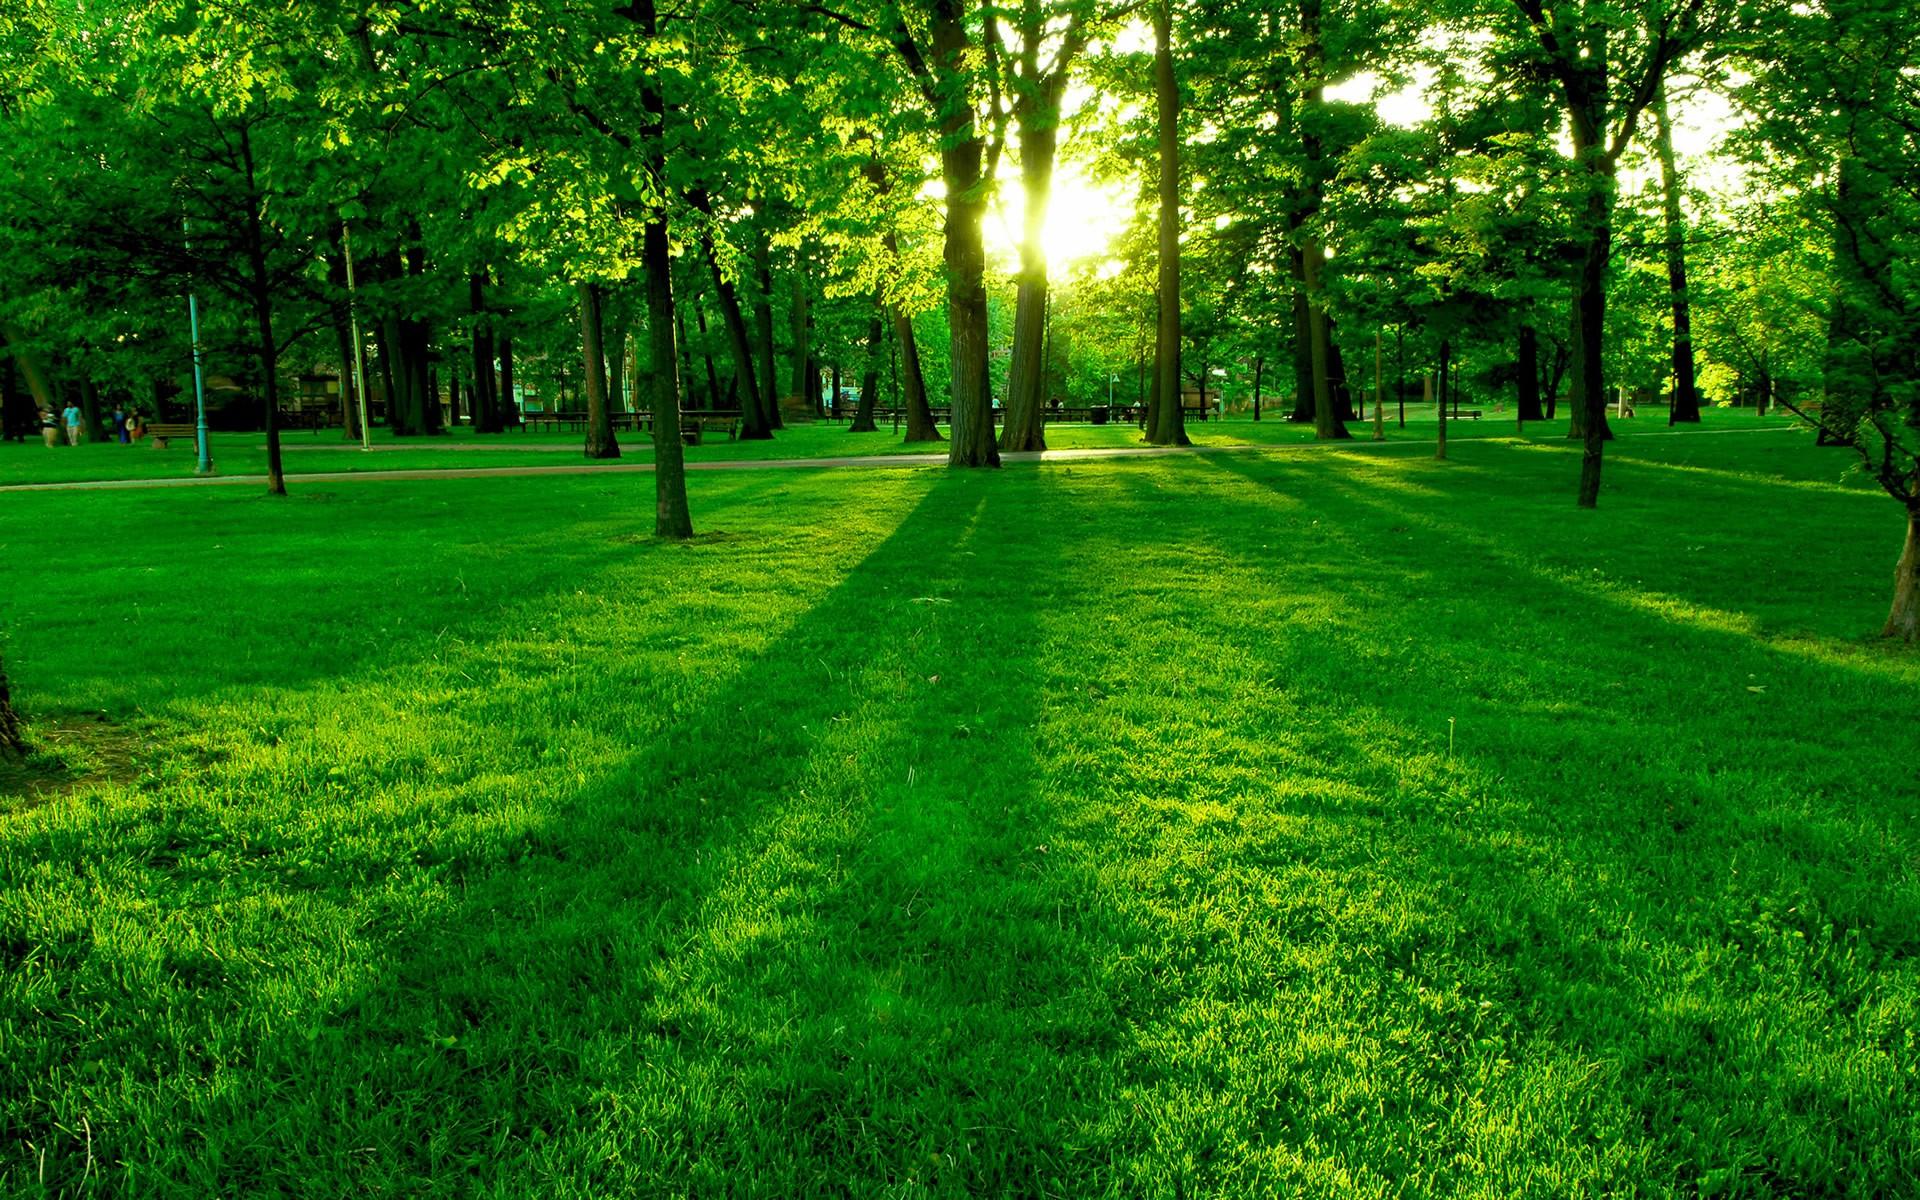 https://get.wallhere.com/photo/sunlight-trees-landscape-forest-nature-grass-park-plants-field-photography-branch-green-structure-golf-course-light-tree-leaf-grassland-plant-pasture-meadow-lawn-woodland-habitat-natural-environment-woody-plant-sport-venue-77737.jpg